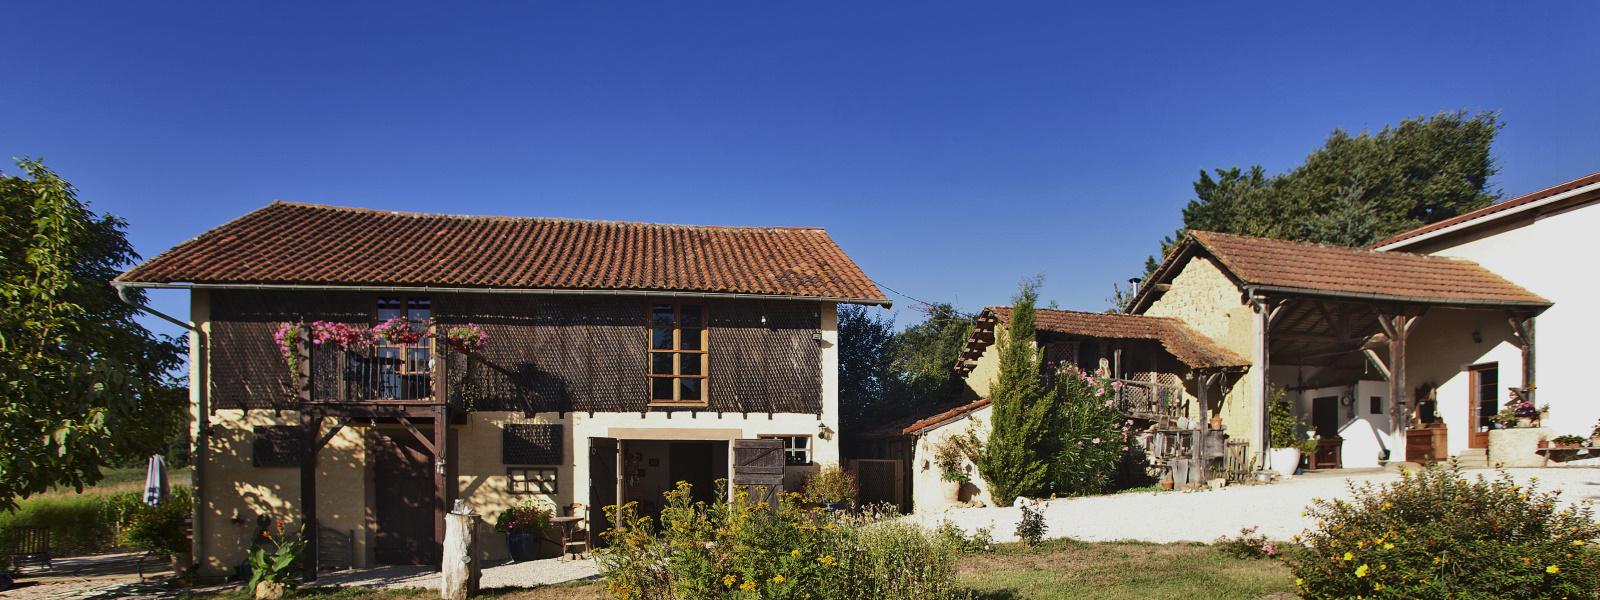 Start - Maison Vue Pyrénées